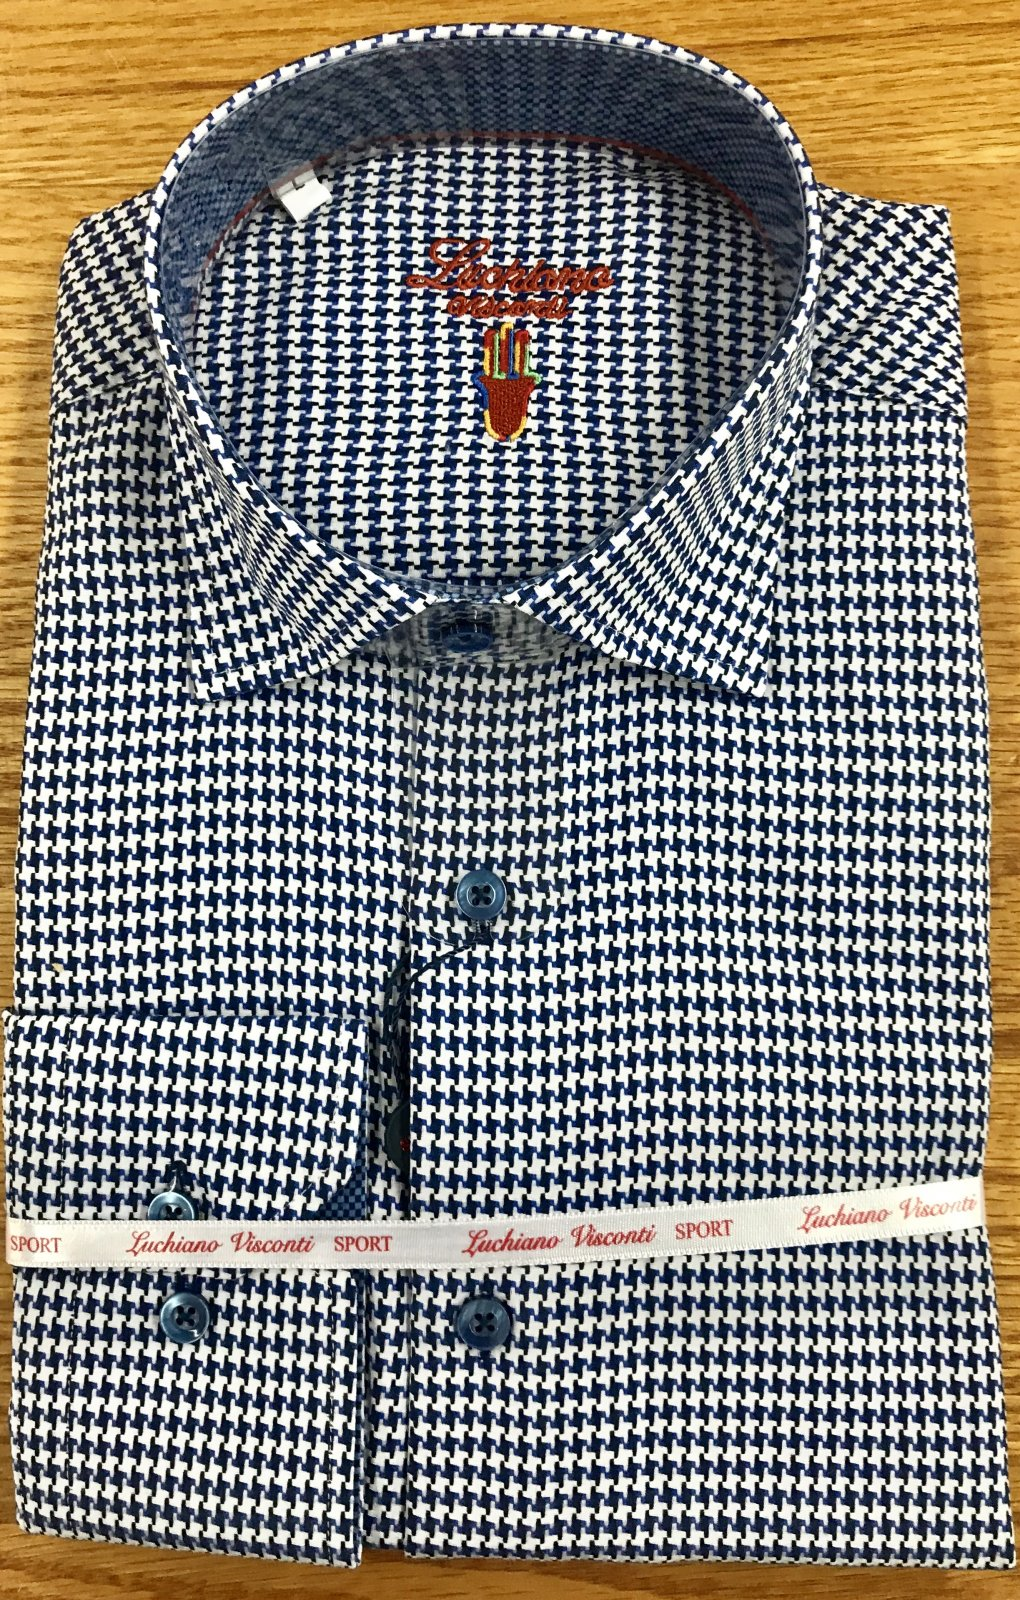 Luchiano Visconti LS Sportshirt 3952